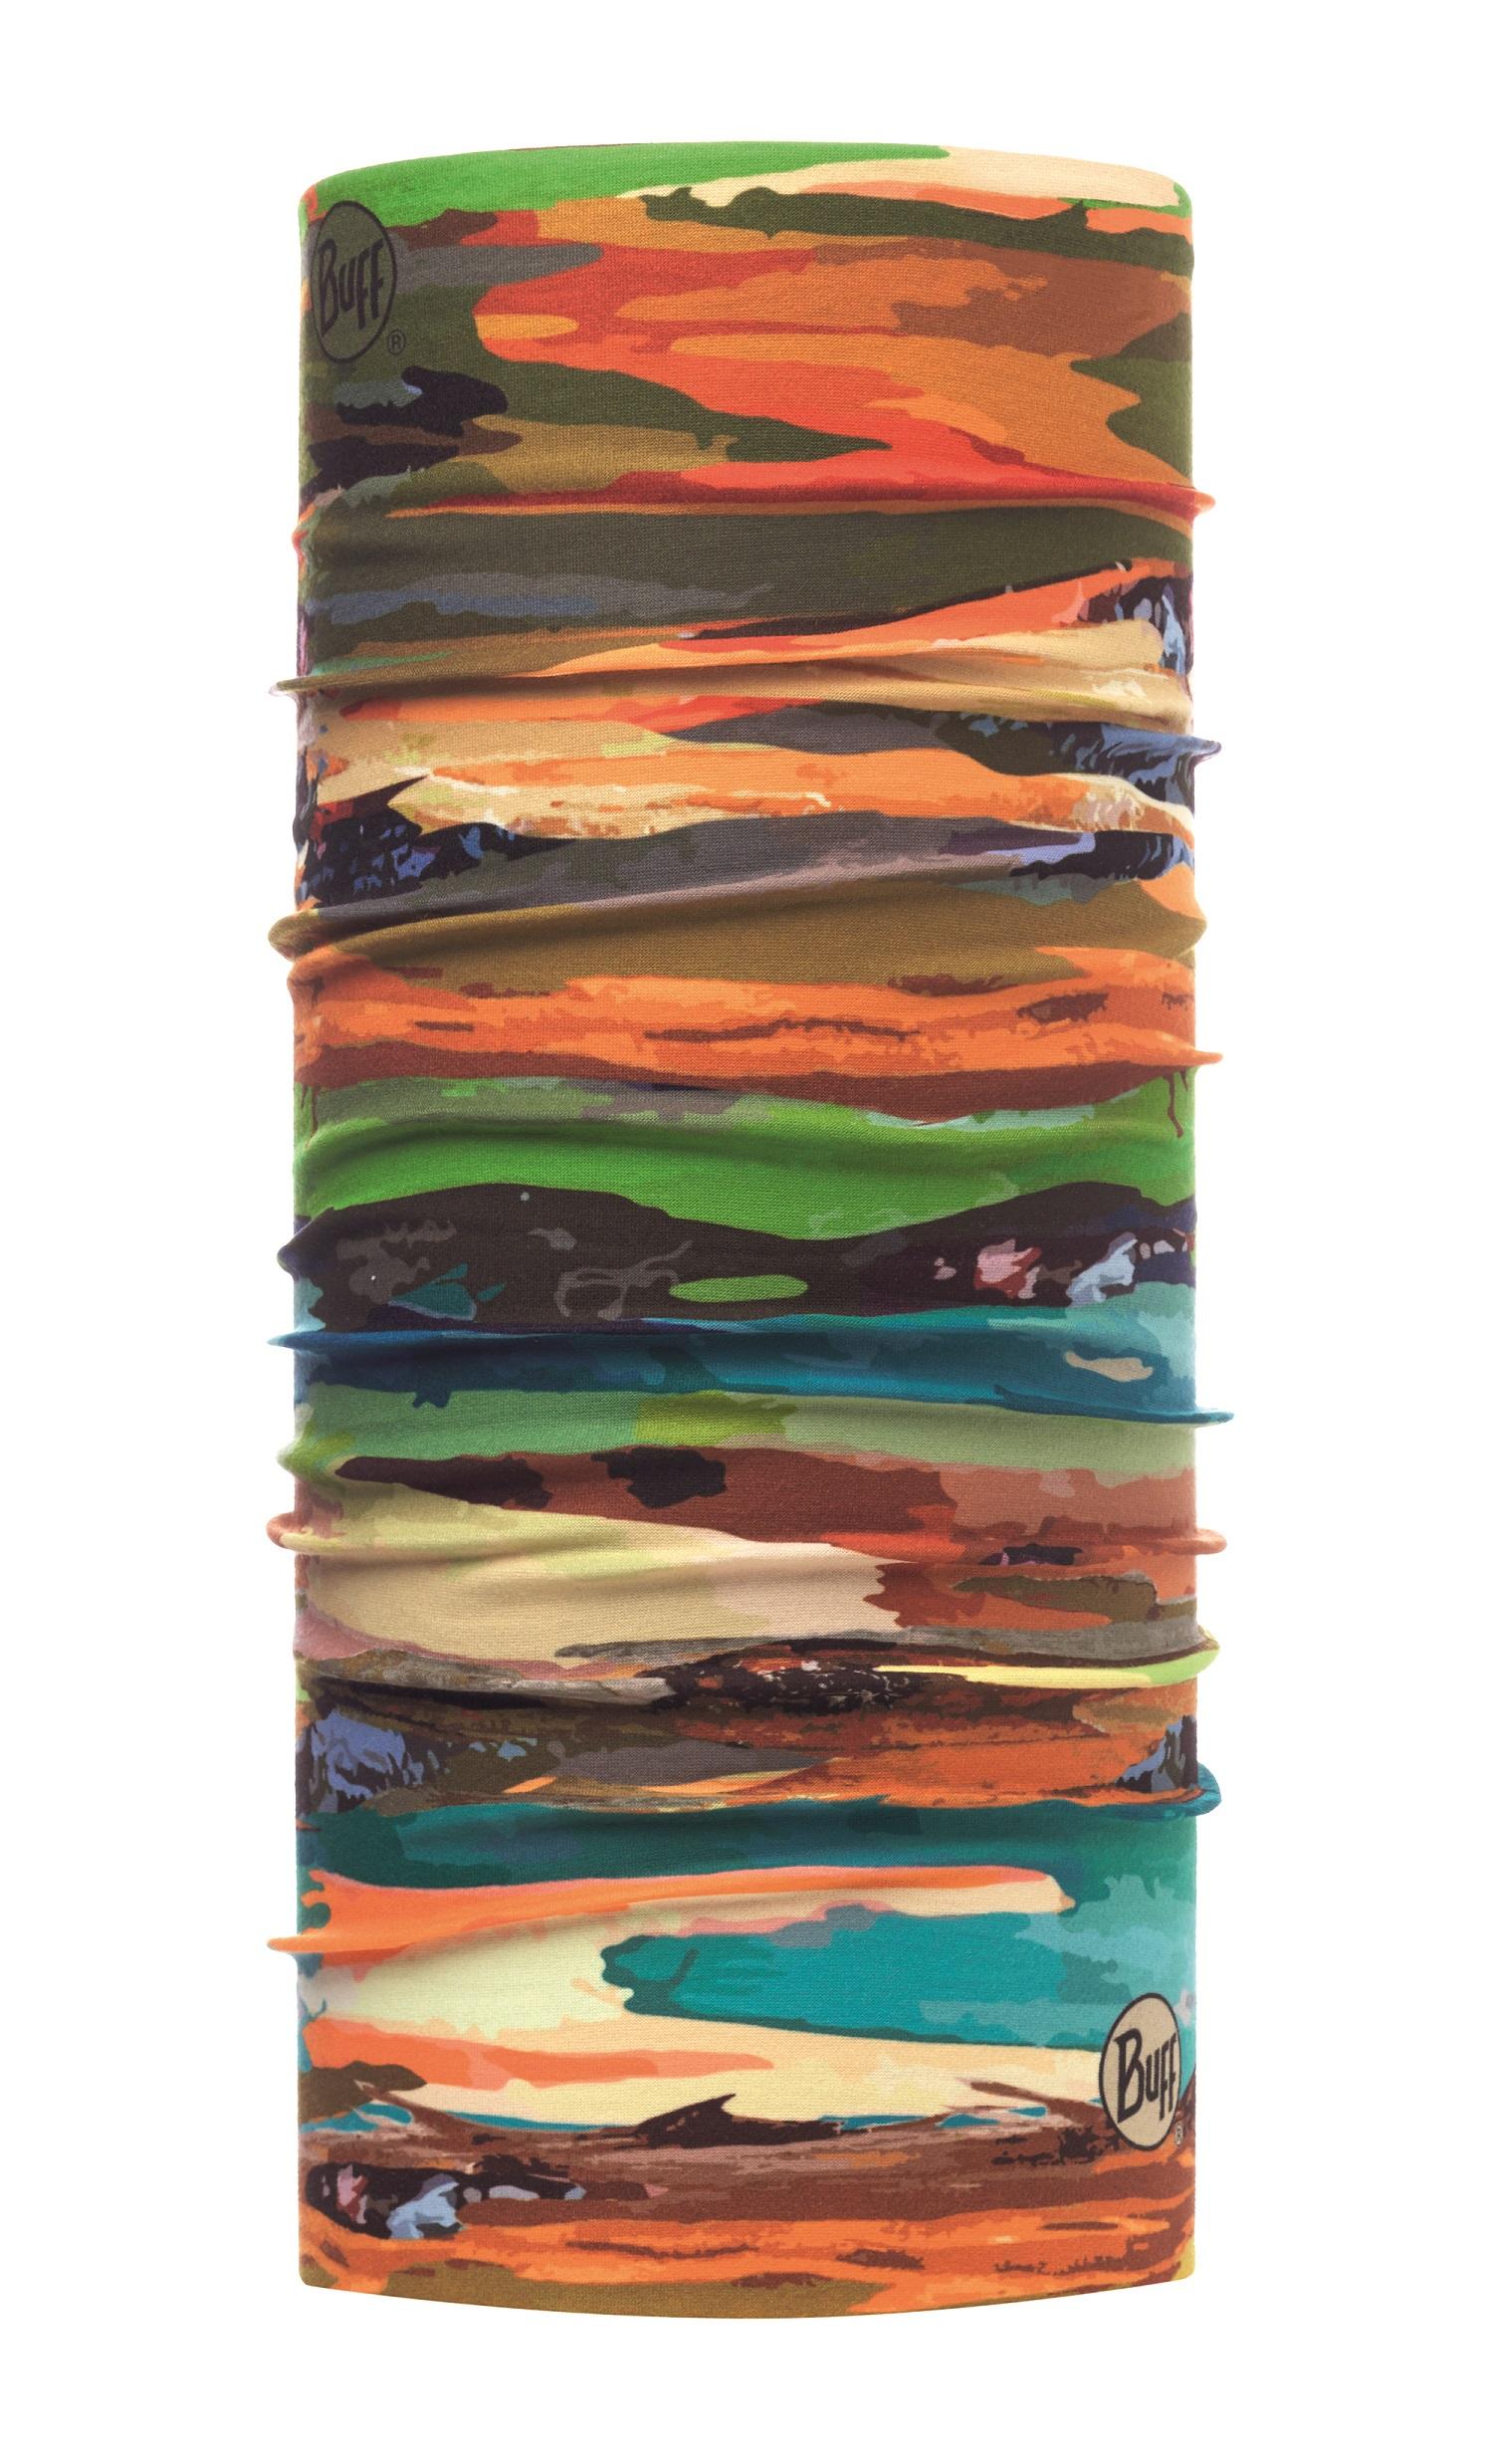 Бандана BUFF UV INSECT SHIELD PROTECTION EUCALYPTUS MULTI, Средства от насекомых - арт. 994340301